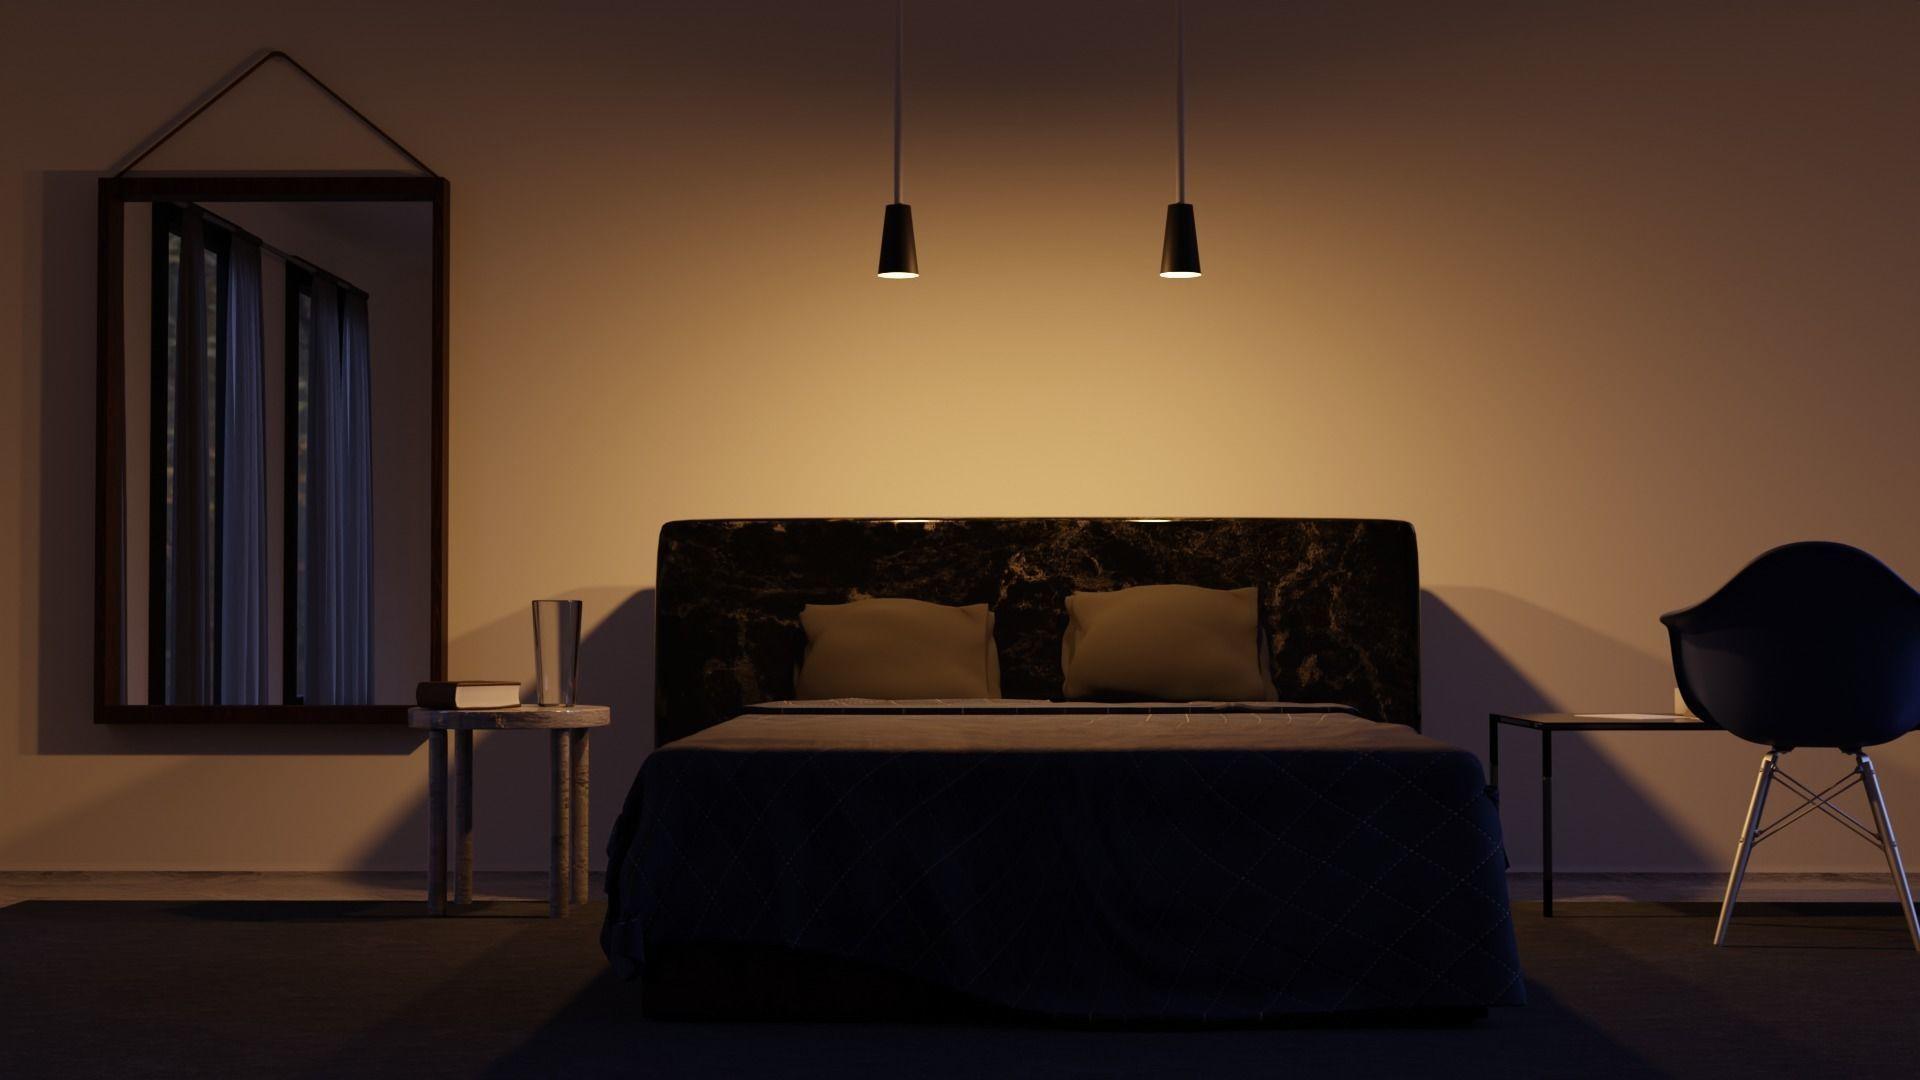 Modern Bedroom Night 4k Textures 3d Cgtrader